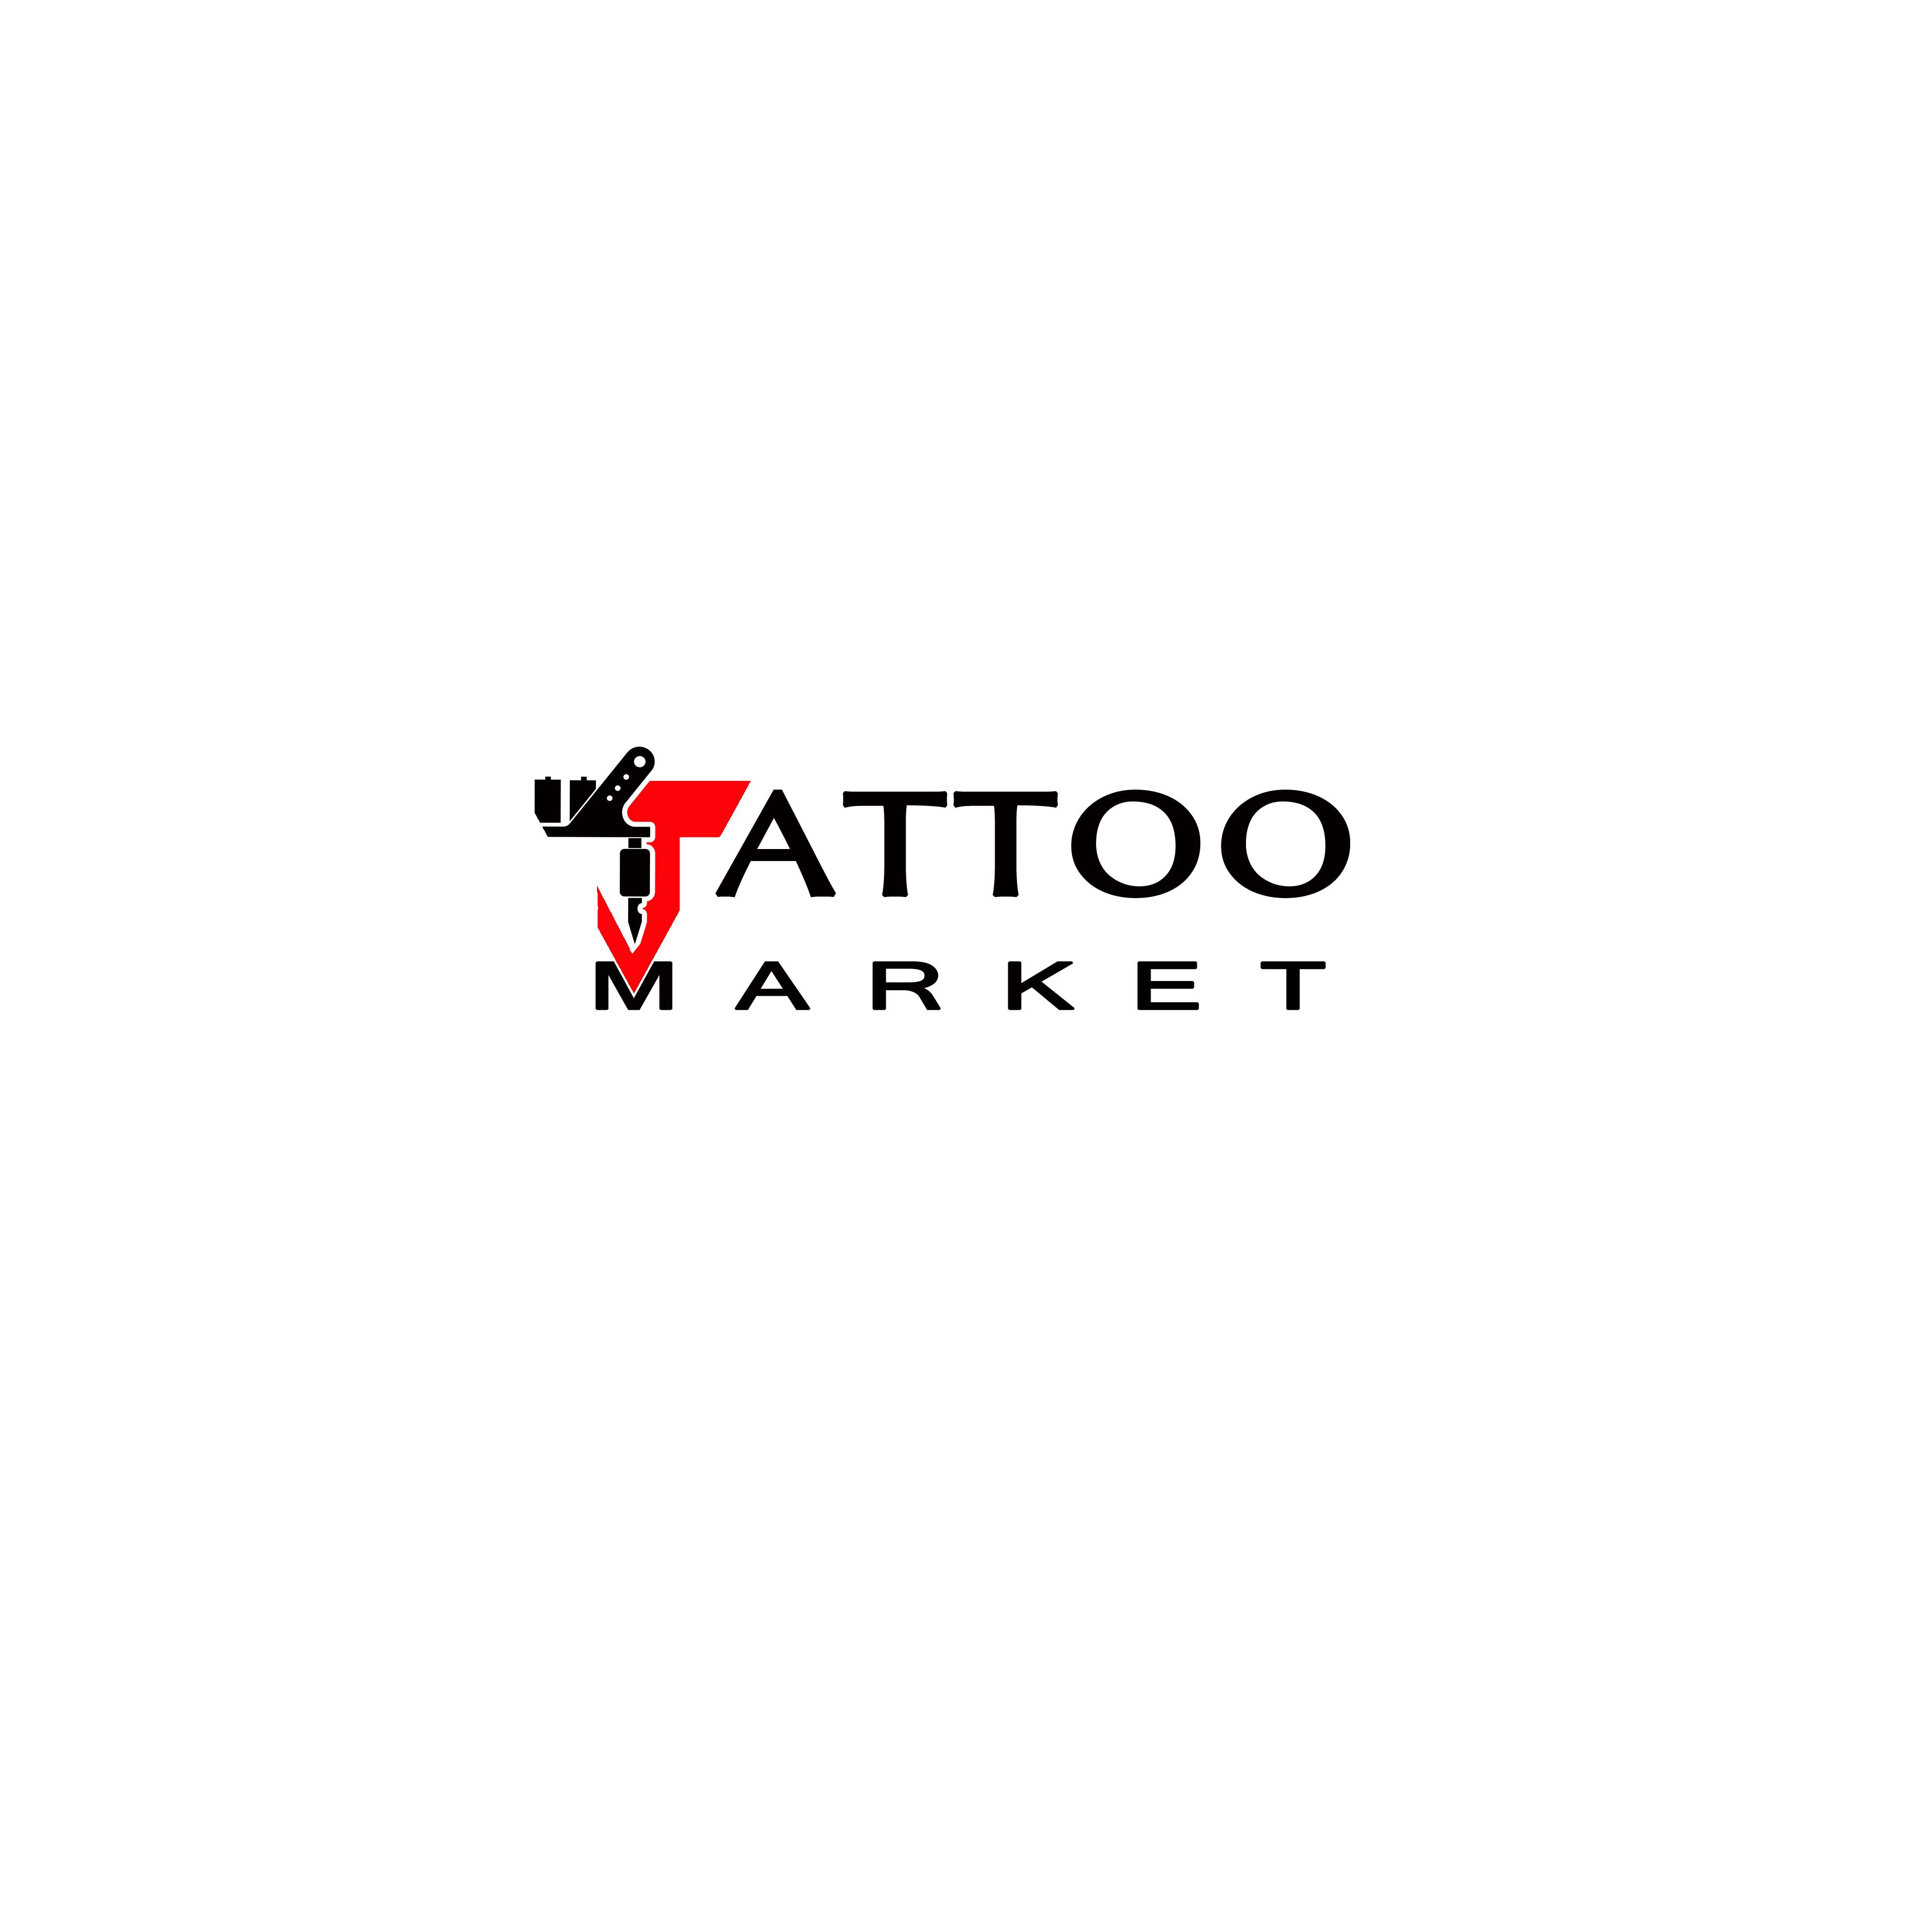 Редизайн логотипа магазина тату оборудования TattooMarket.ru фото f_1375c465bb4d4121.jpg